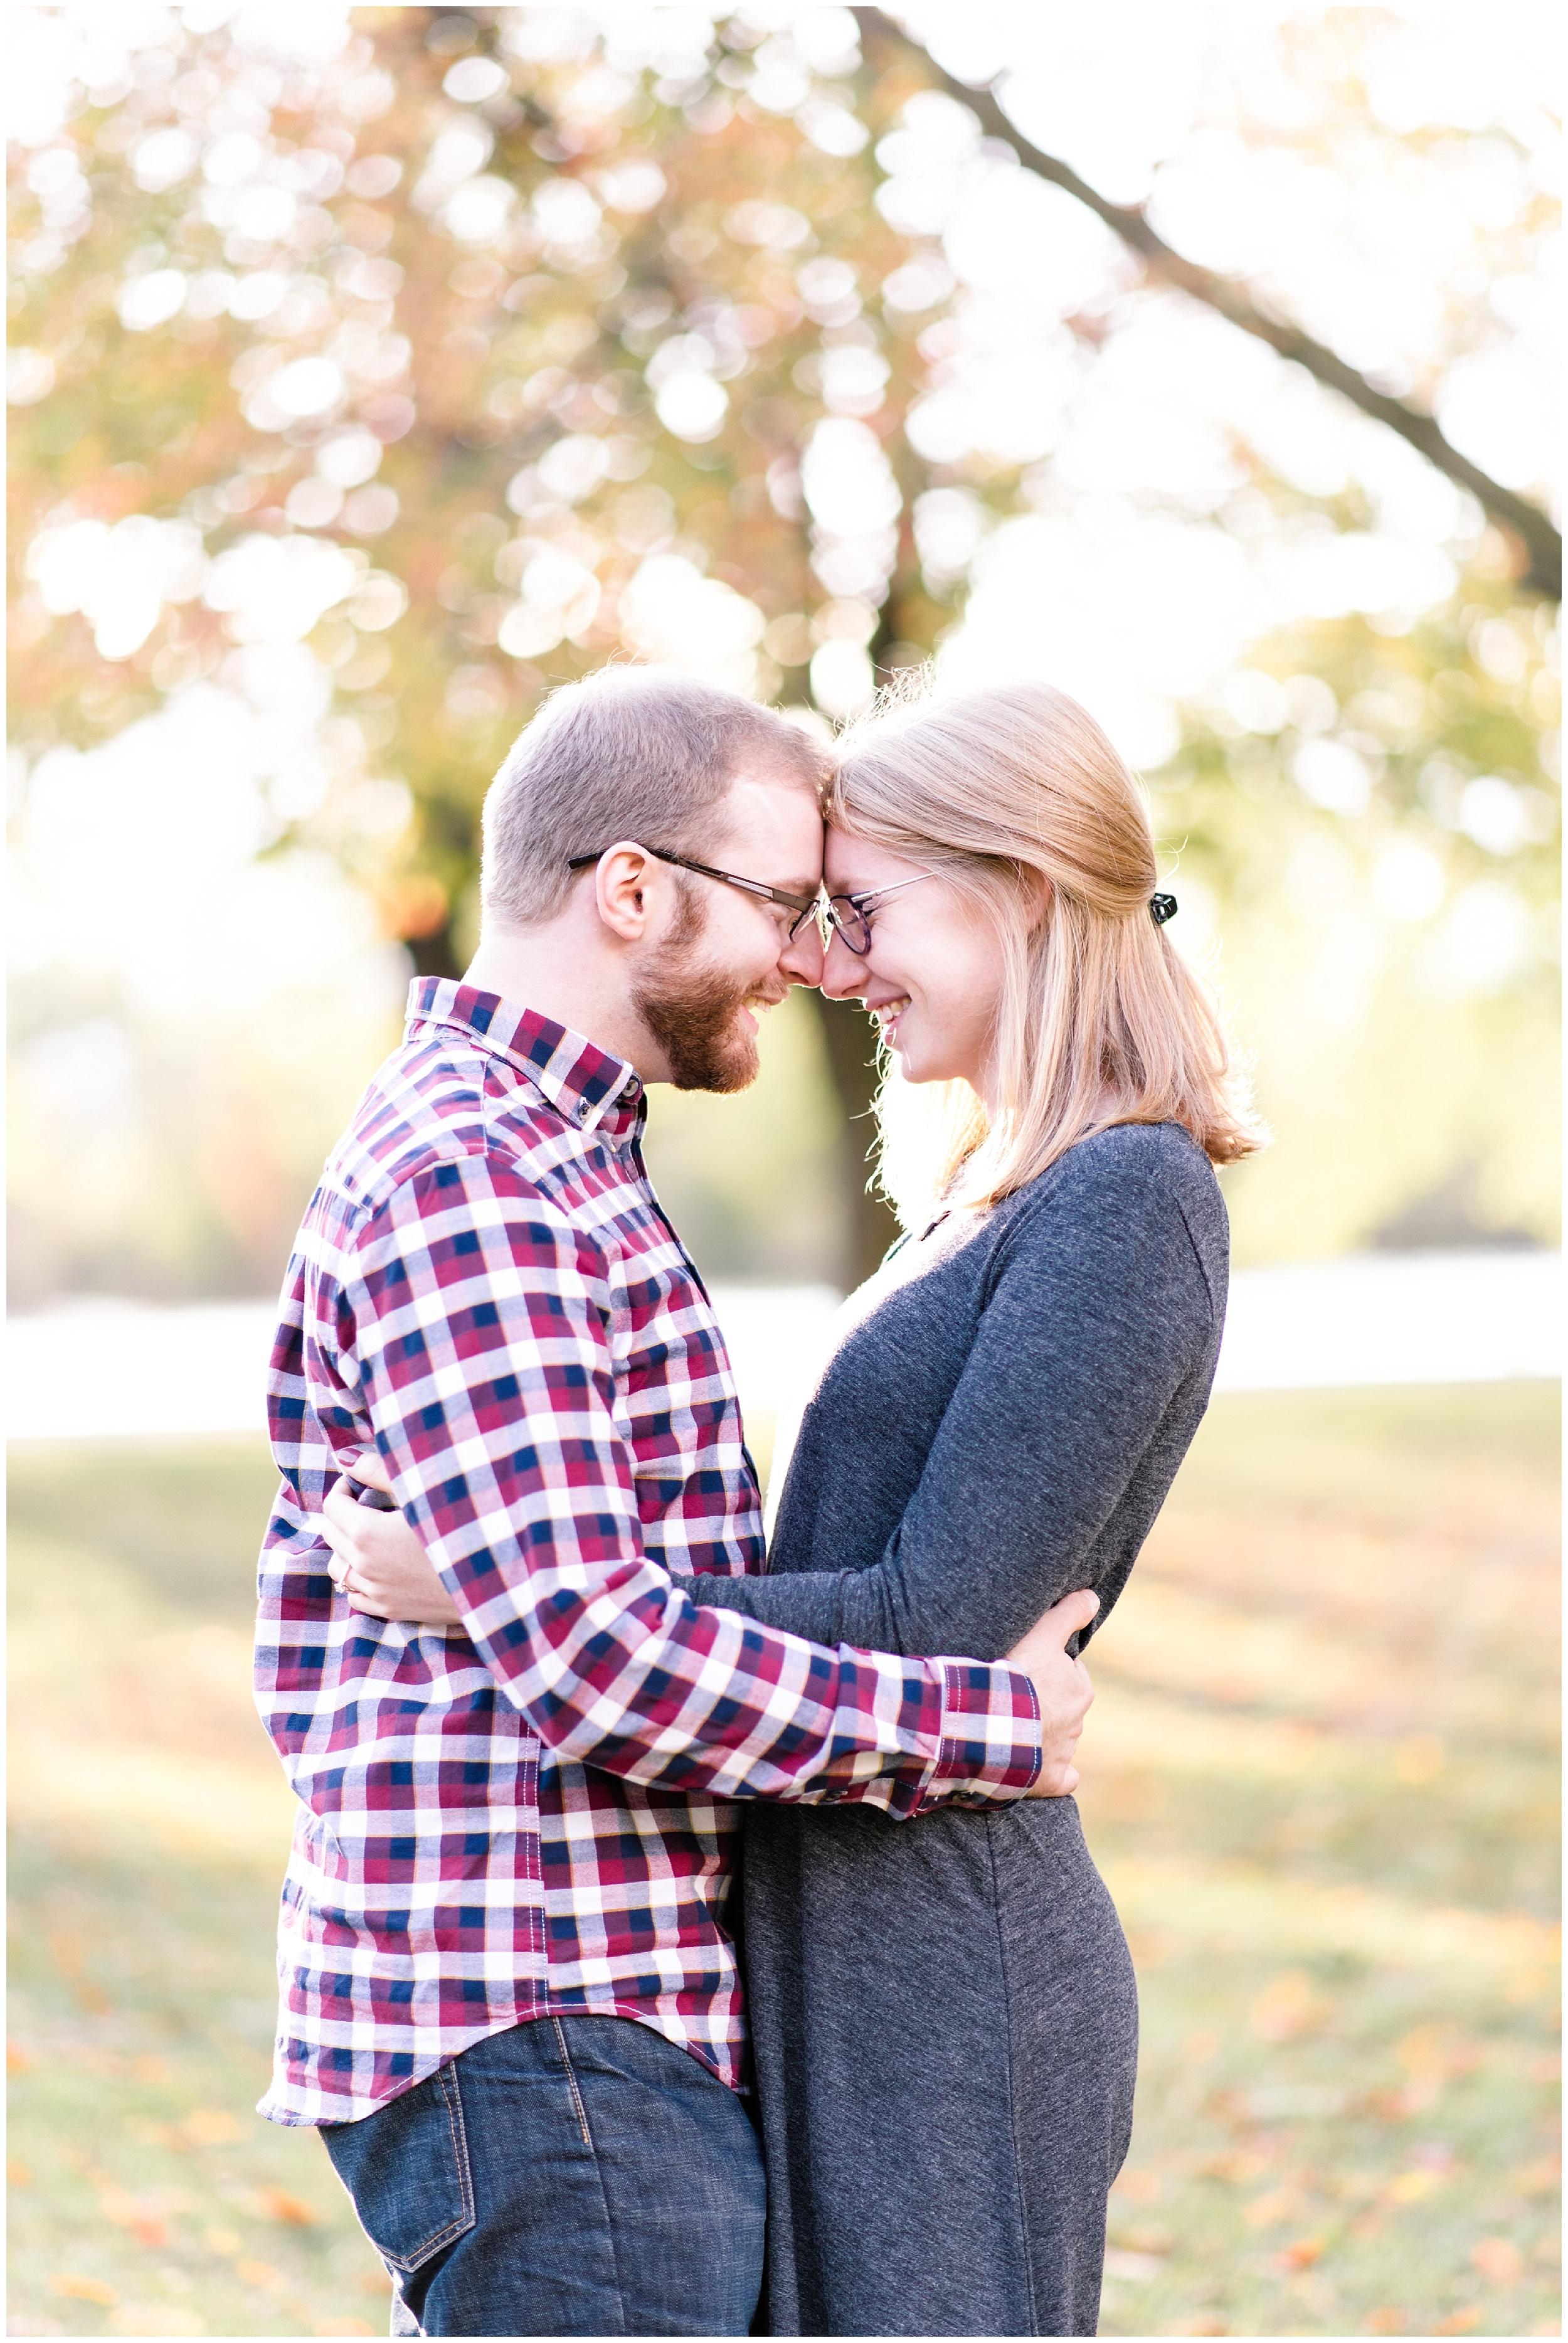 Weddings_by_Raisa_Photography_Grand_Rapids_October_Fall_Engagement_Milwaukee_Wisconsin_Photographer_0004.jpg